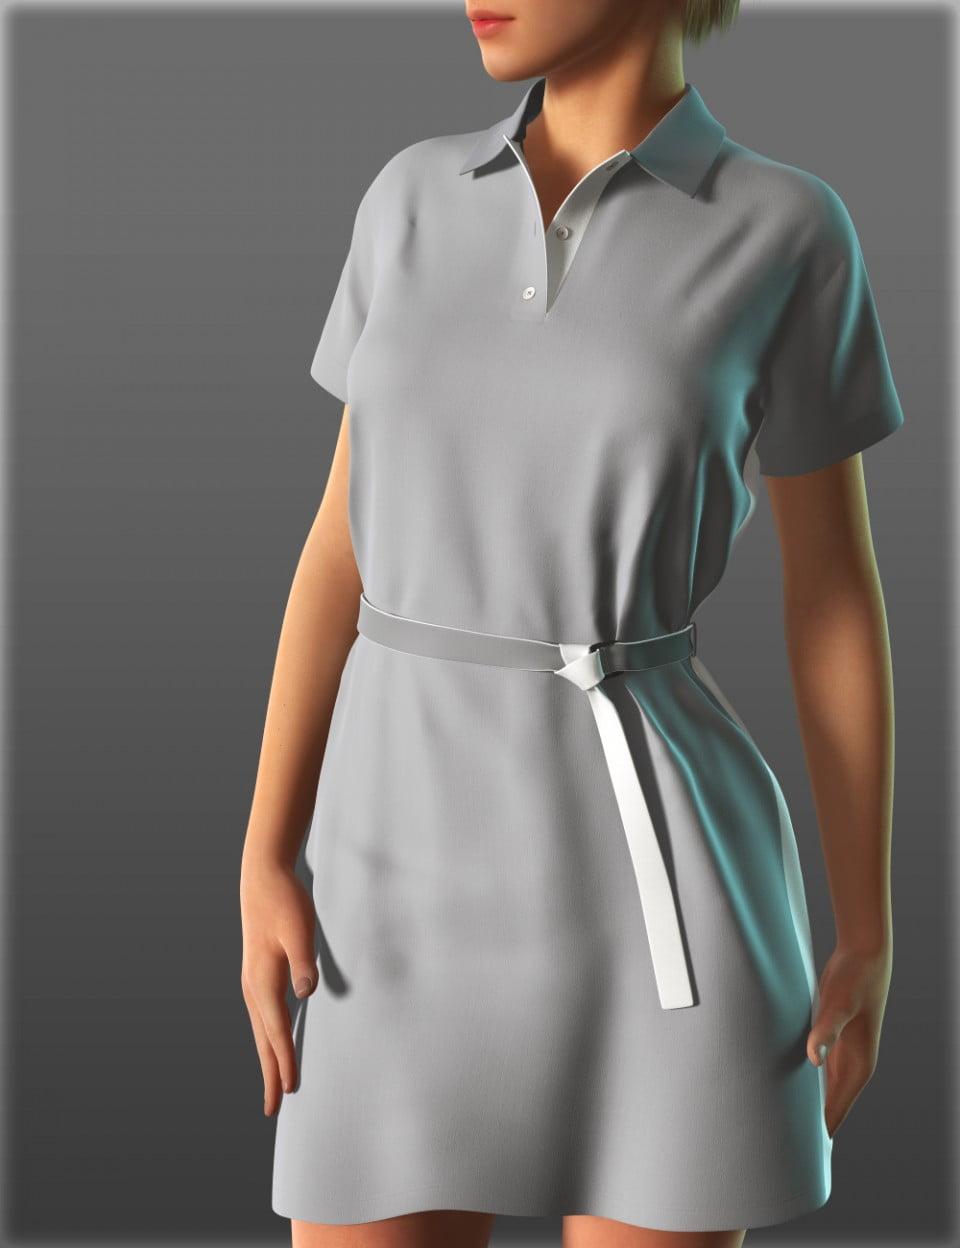 00-main-short-sleeve-shirt-dress-for-genesis-2-females-daz3d